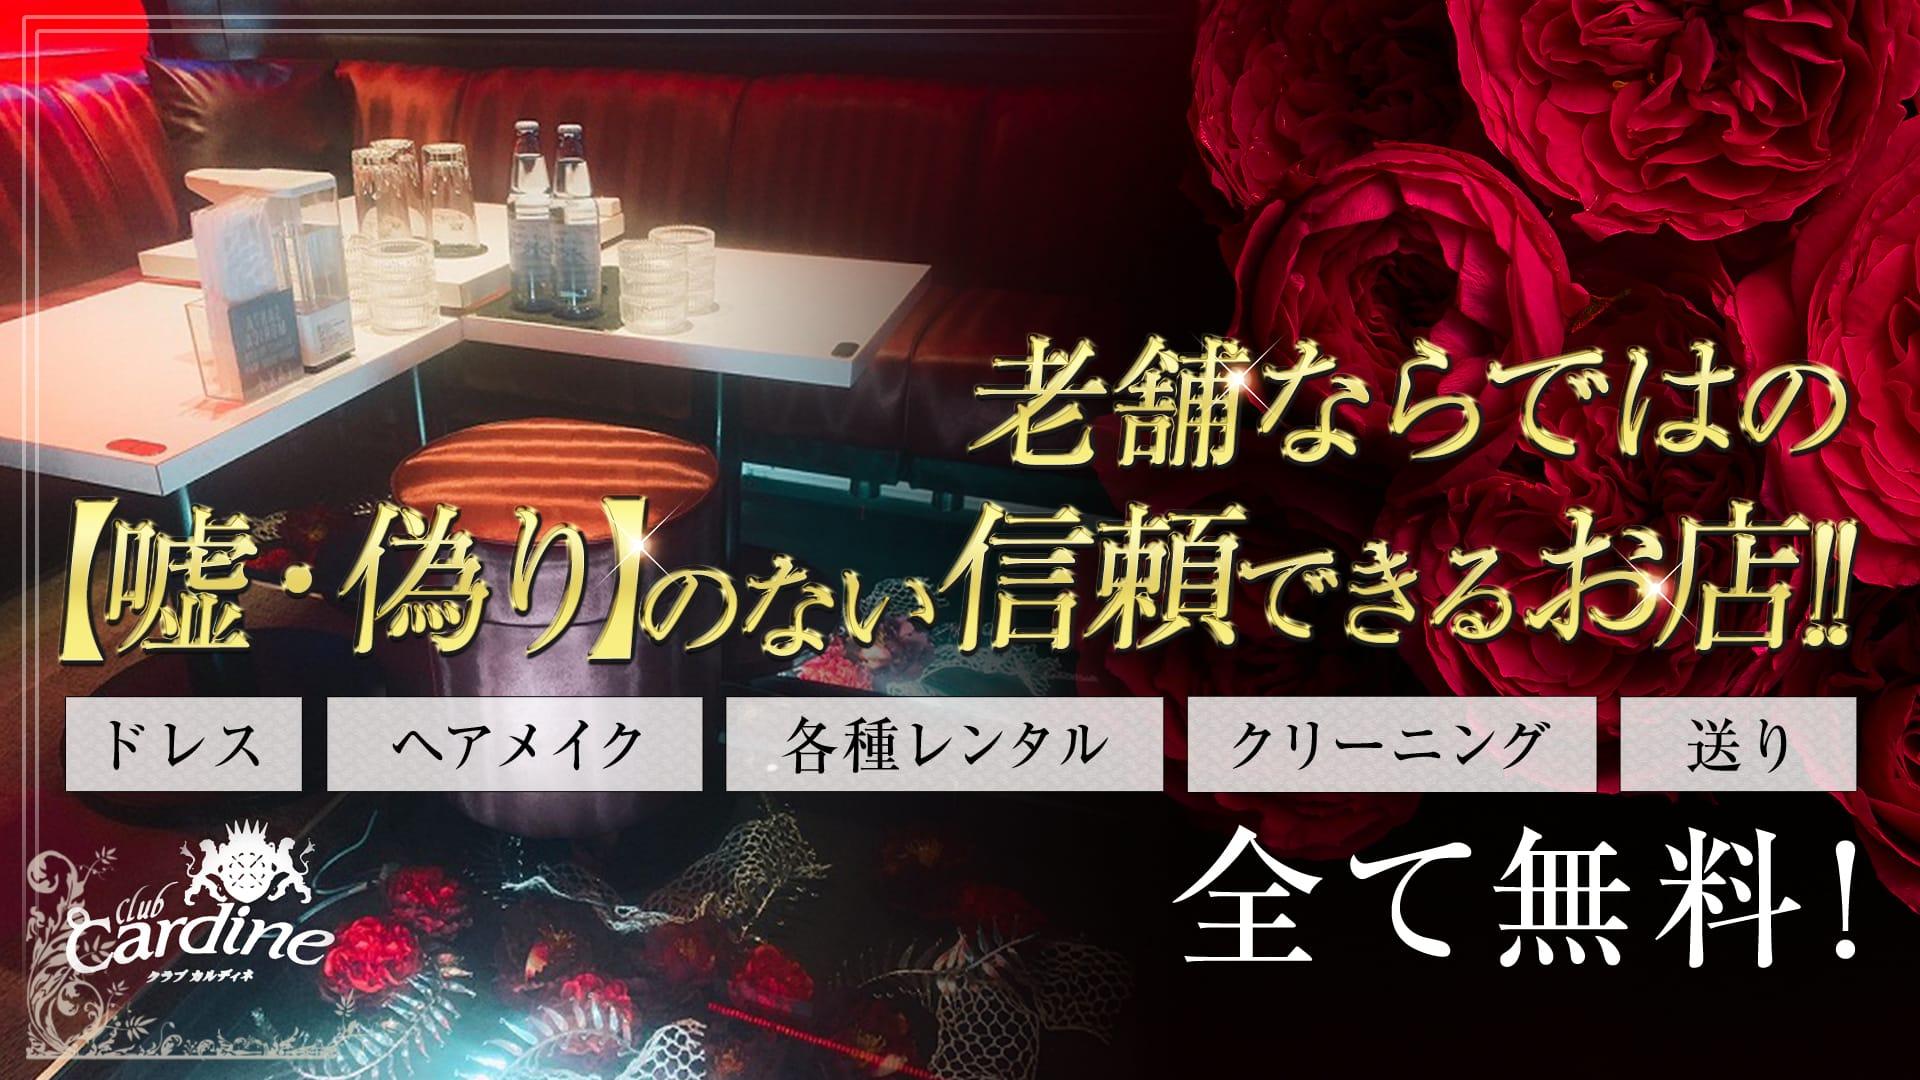 club Cardine(カルディネ)【公式求人・体入情報】 草加キャバクラ TOP画像